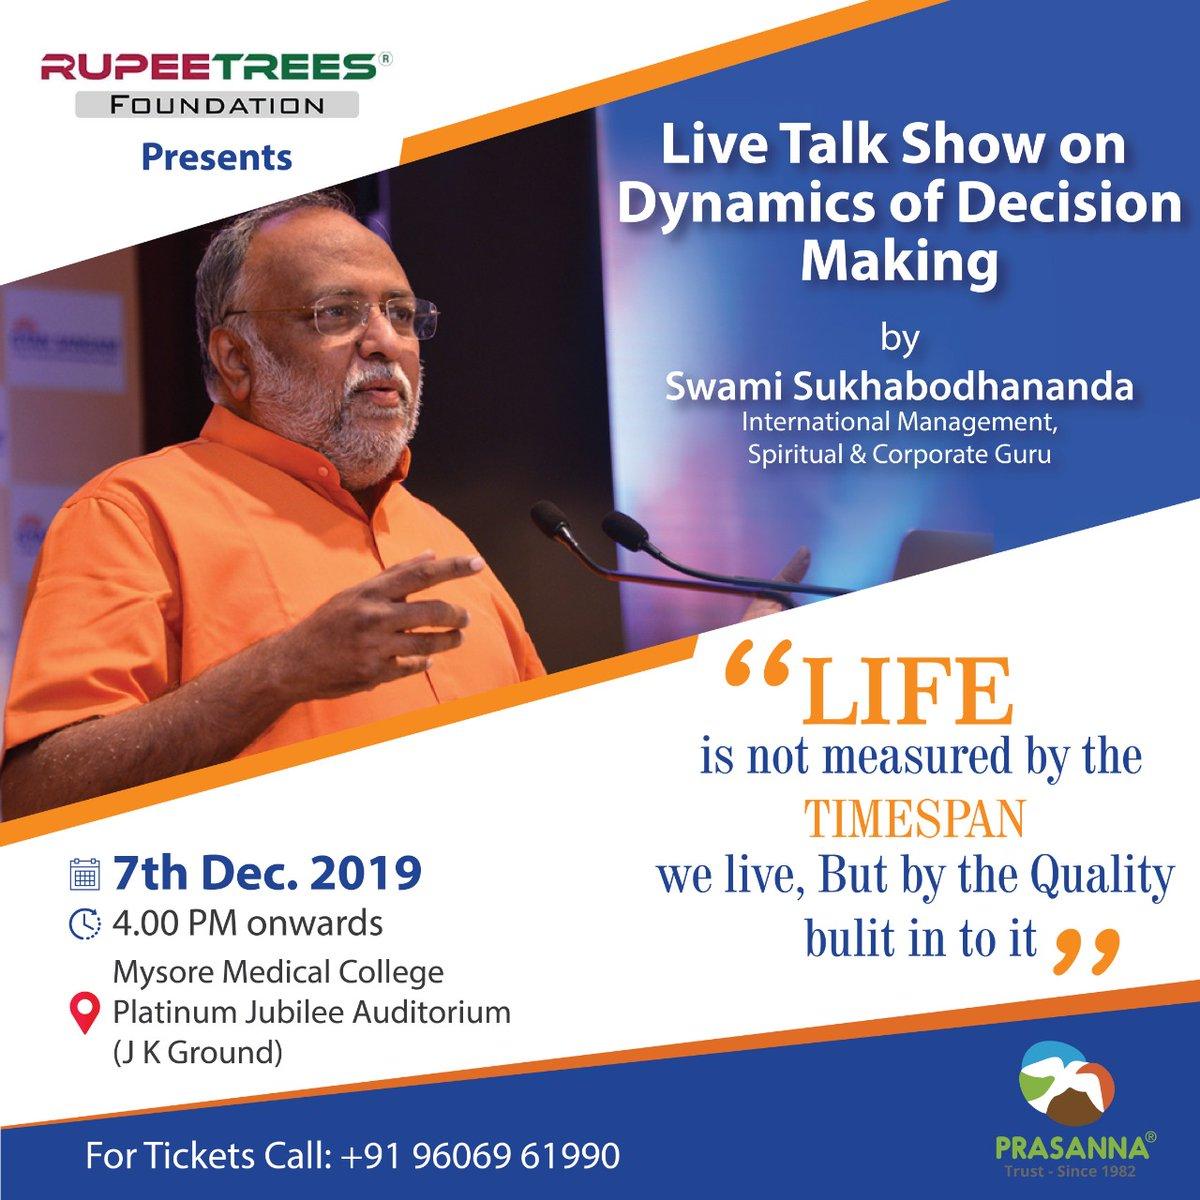 #eventsinmysore #RupeetreesFoundation #swamisukhabodhananda #prasannatrust #mysoreevents #live #dynamics #decisionmakingpic.twitter.com/NzCJEX6NzE